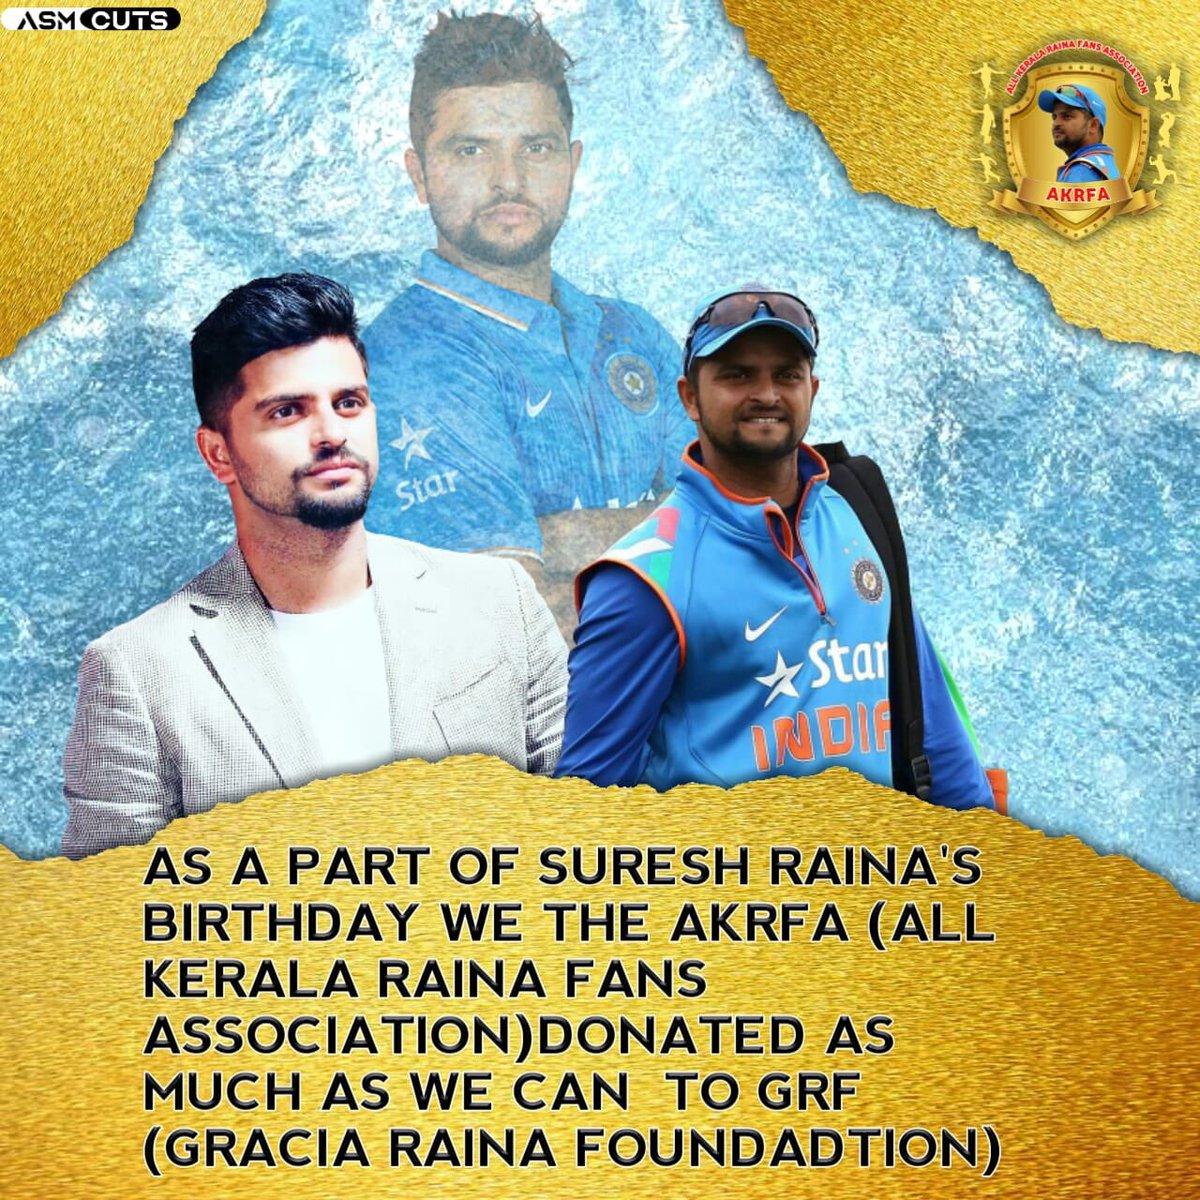 As A Part Of @ImRaina 's Birthday  All Kerala Raina Fans (@Akrfa_offl ) Donated As Much As We Can To  @grfCare (Gracia Raina Foundation)  @imRaina    #SureshRaina    #Raina  @trendRaina    @PriyankaCRaina